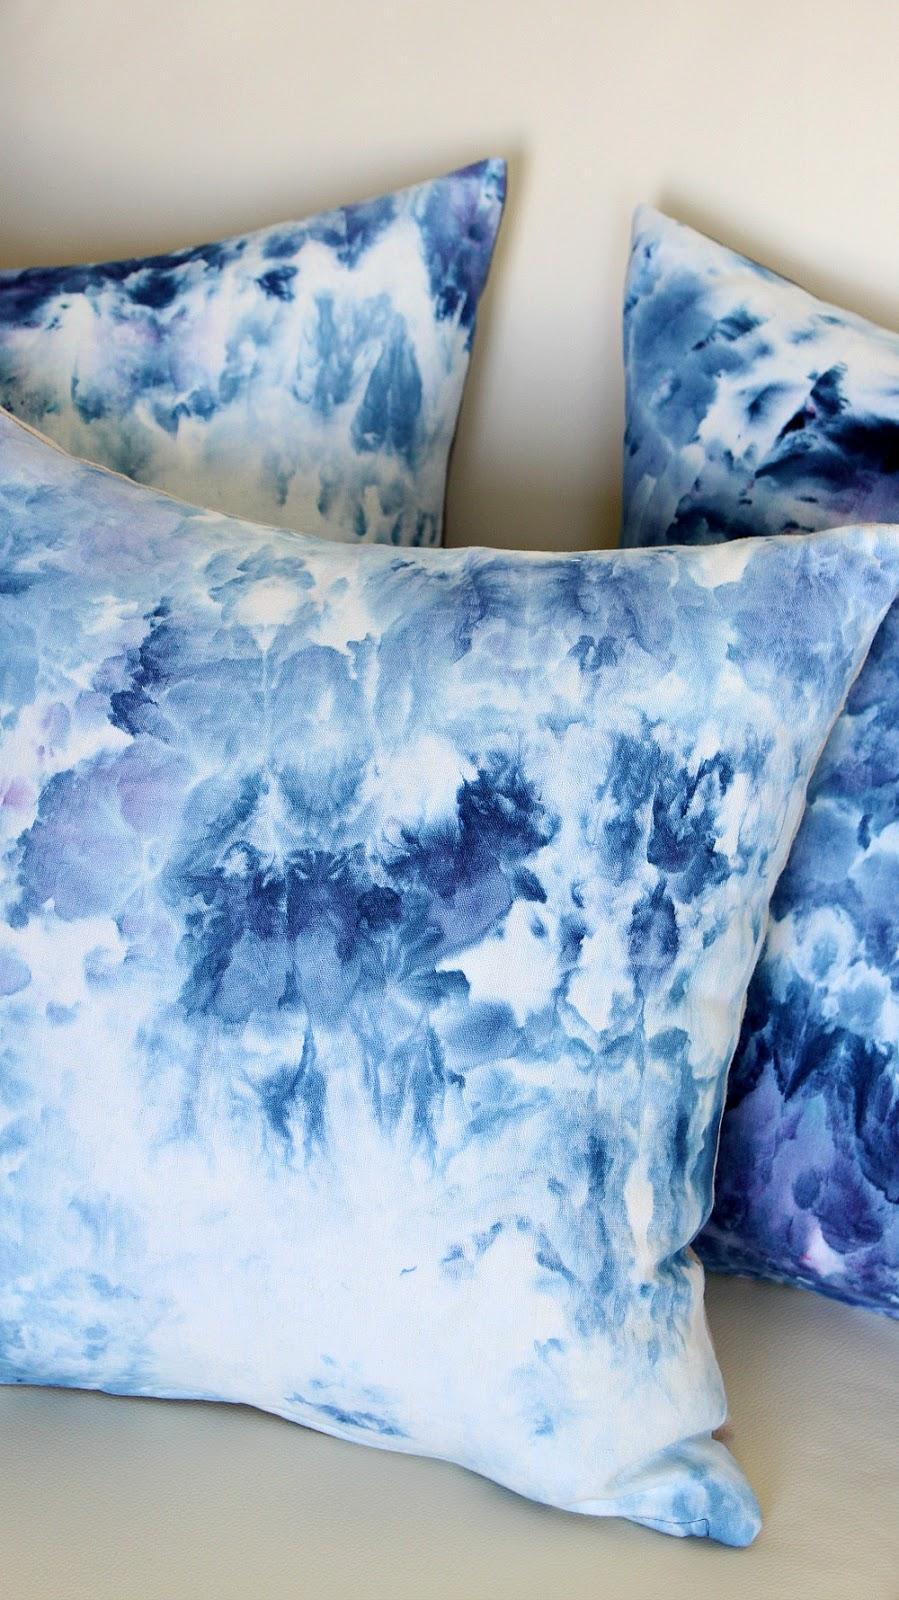 DIY Ice Dyed Pillows | @danslelakehouse